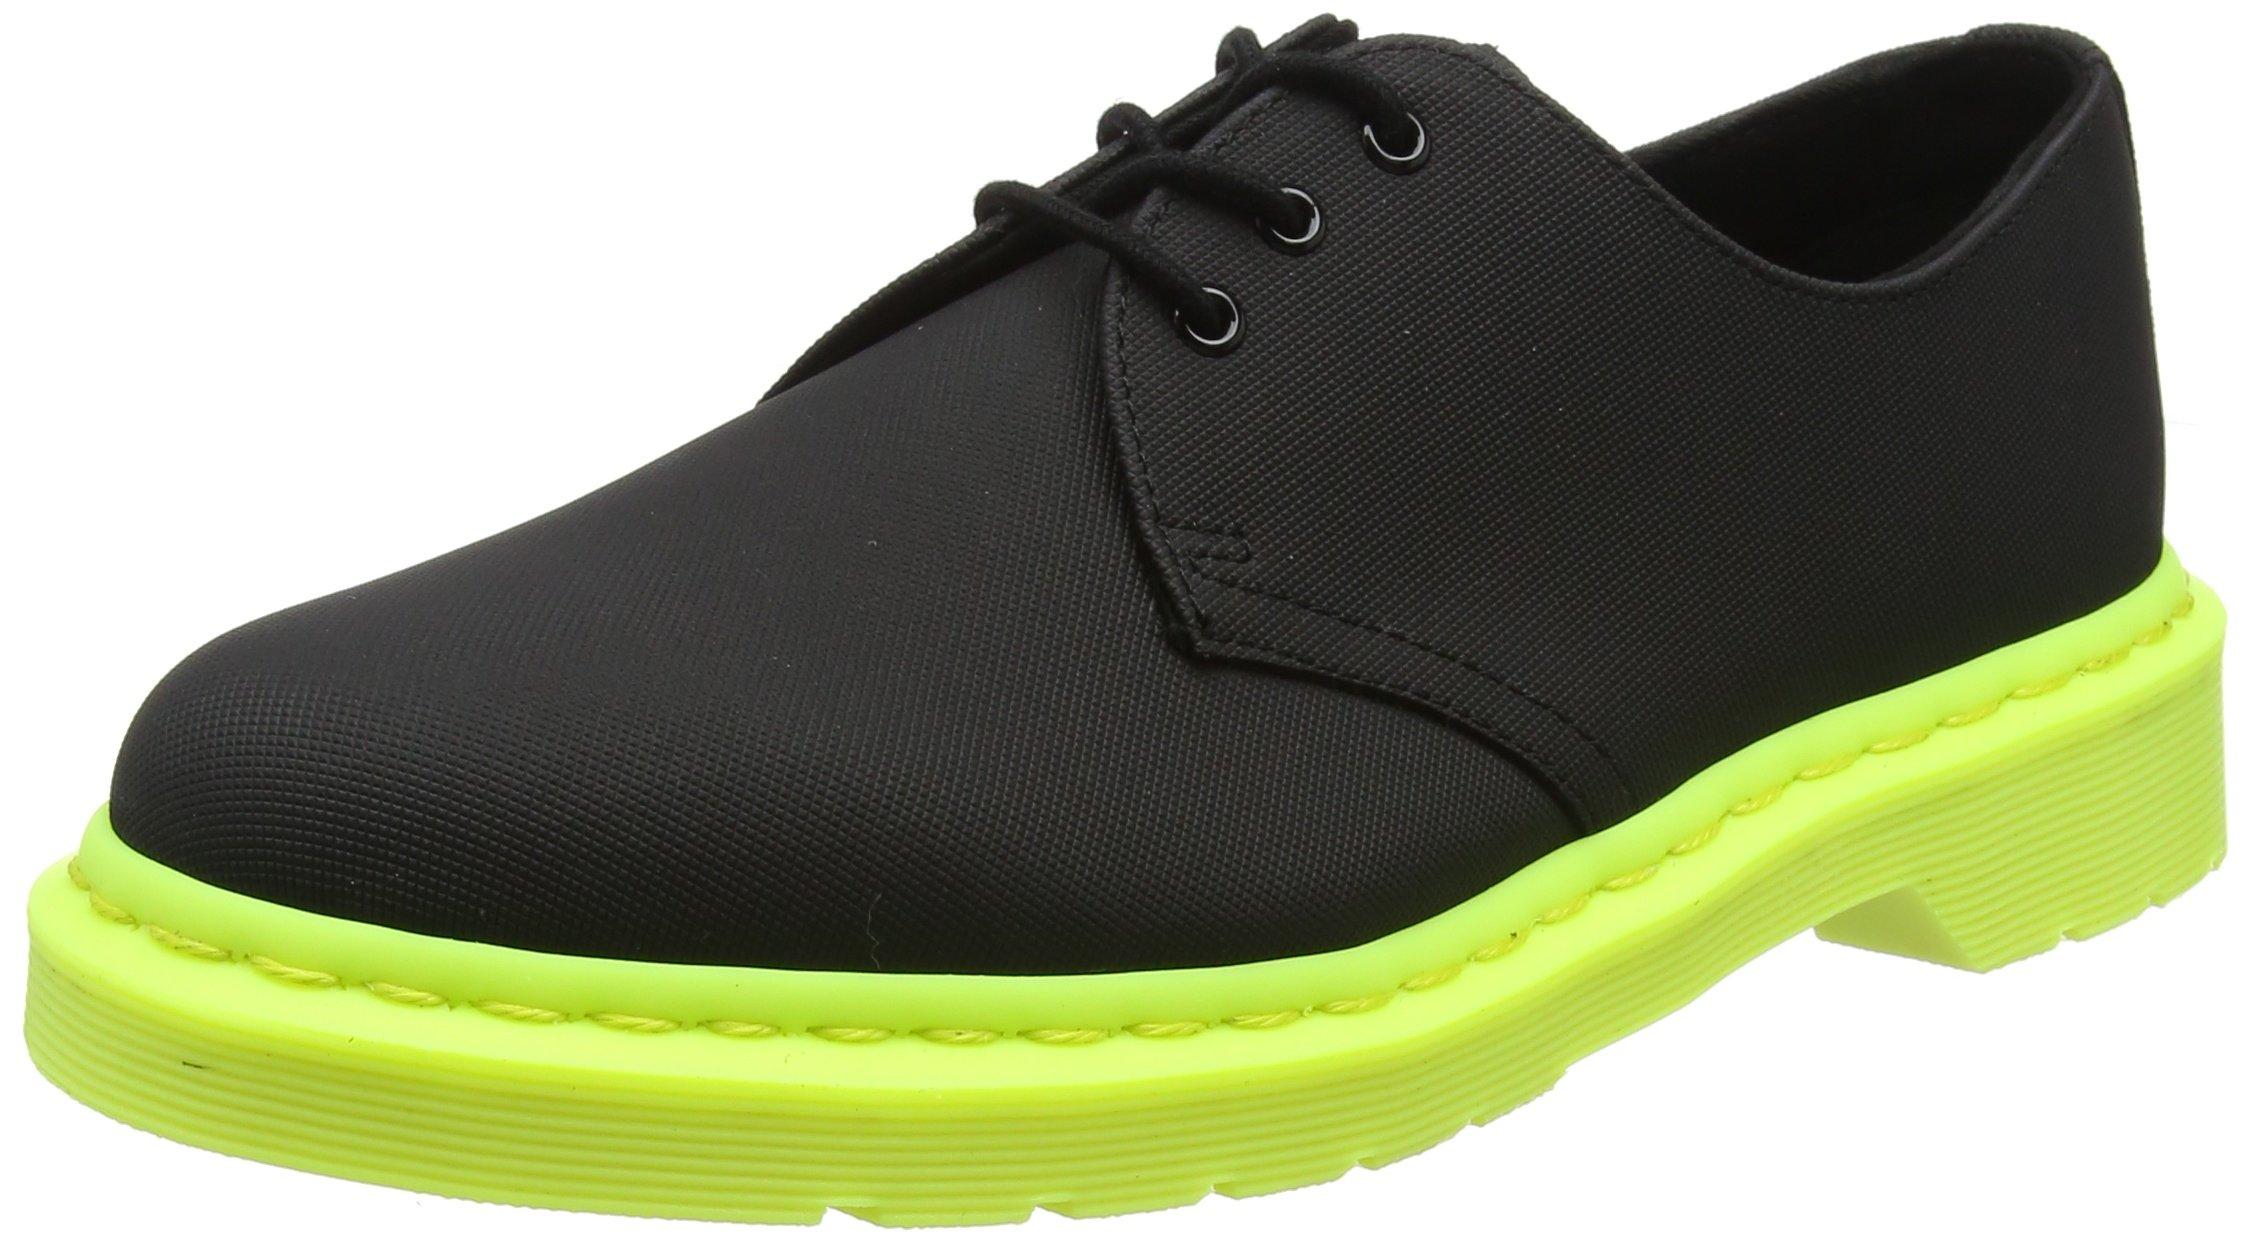 Dr. Martens R22871001 Men's 1461 Shoe, Black Ajax - 11 UK/12 D(M) US